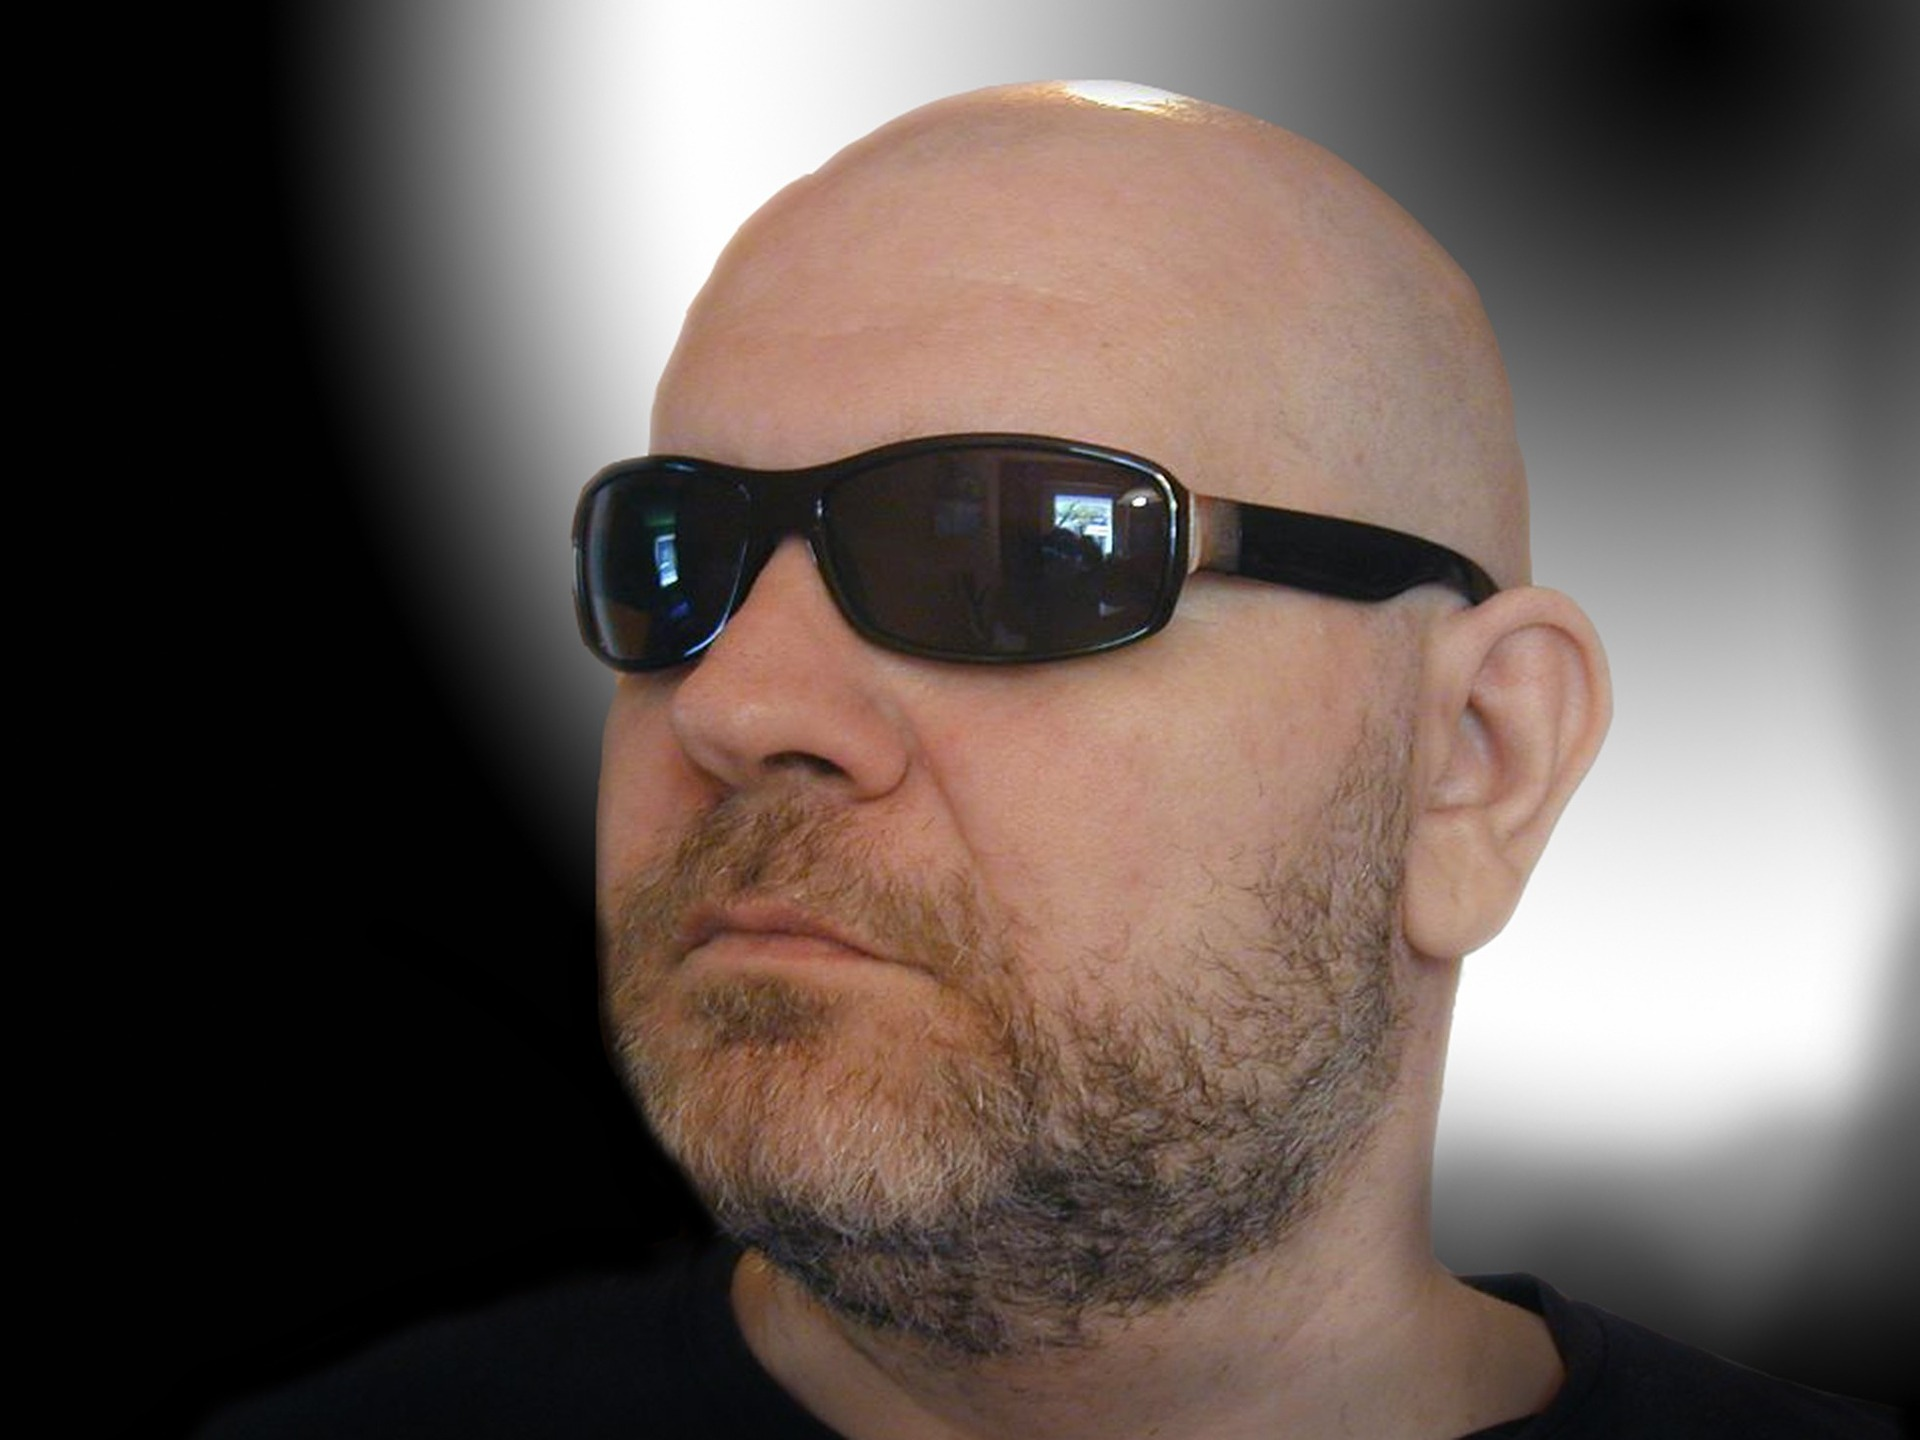 Haarimplantate - Der Weg zum vollen Haar auf men-styling.de